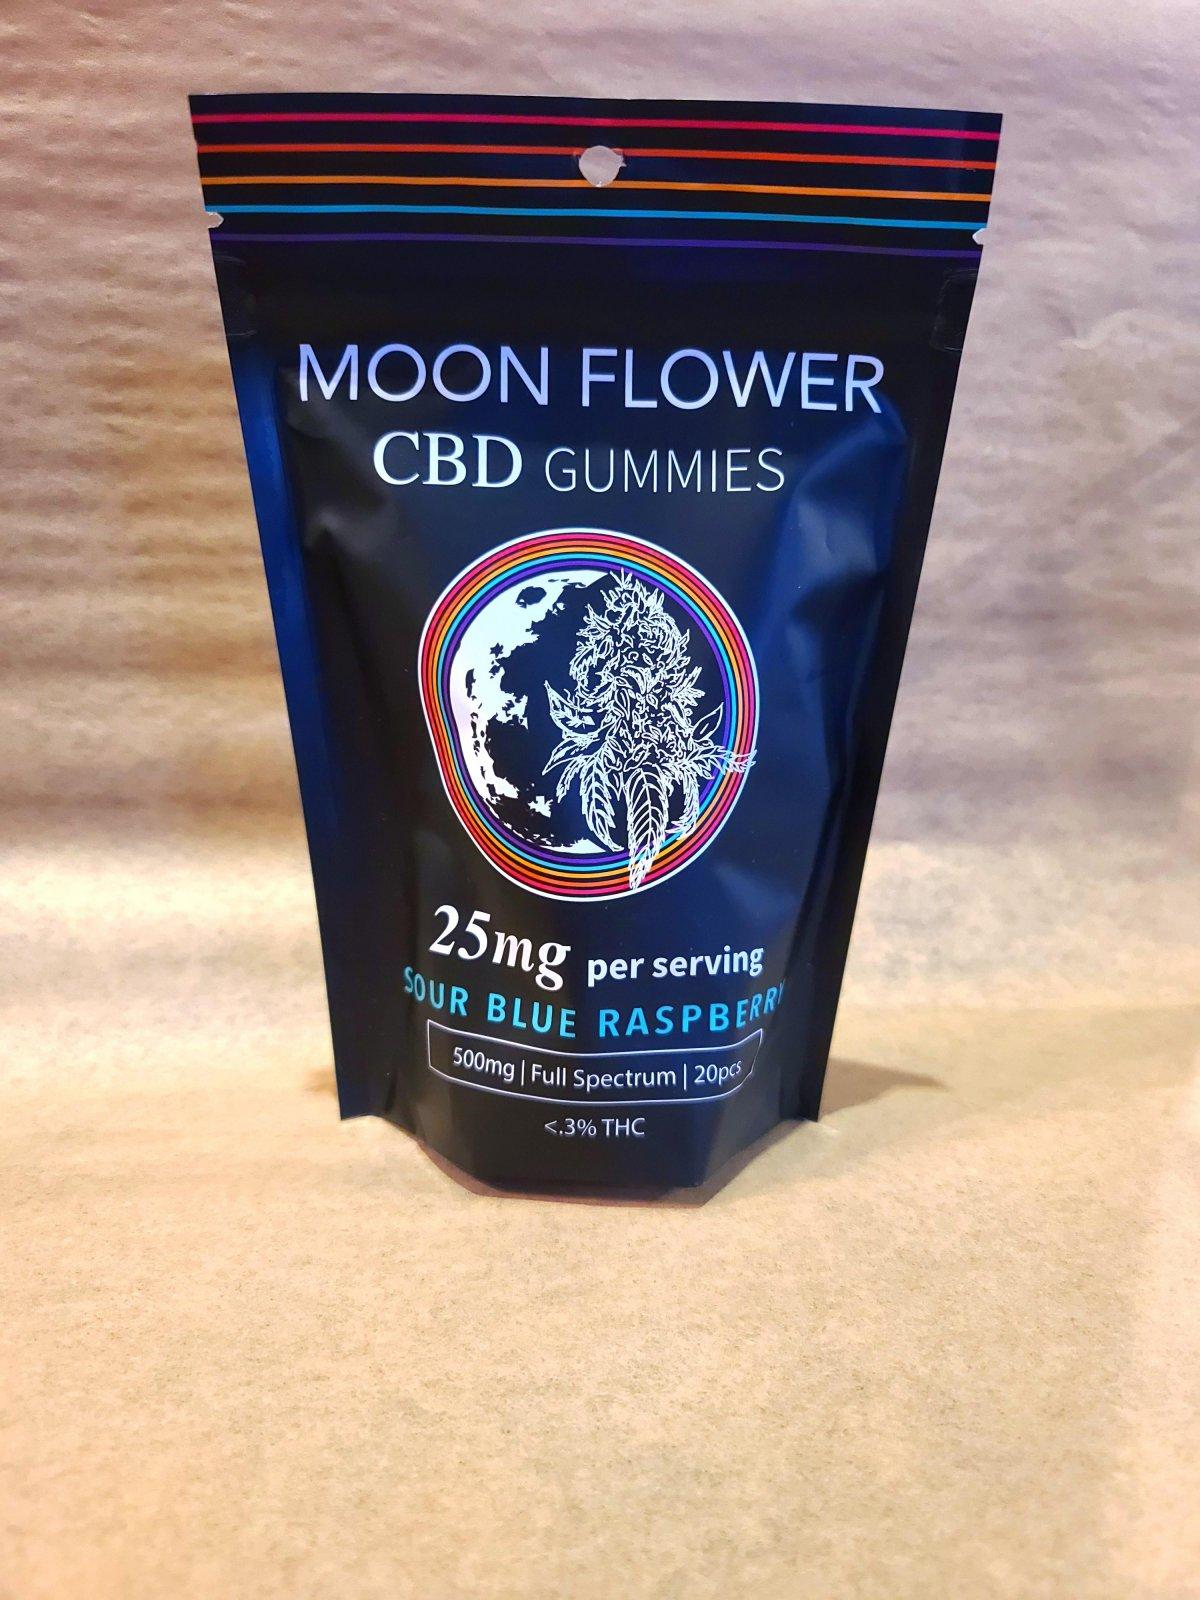 25mg Moonflower CBD Gummies